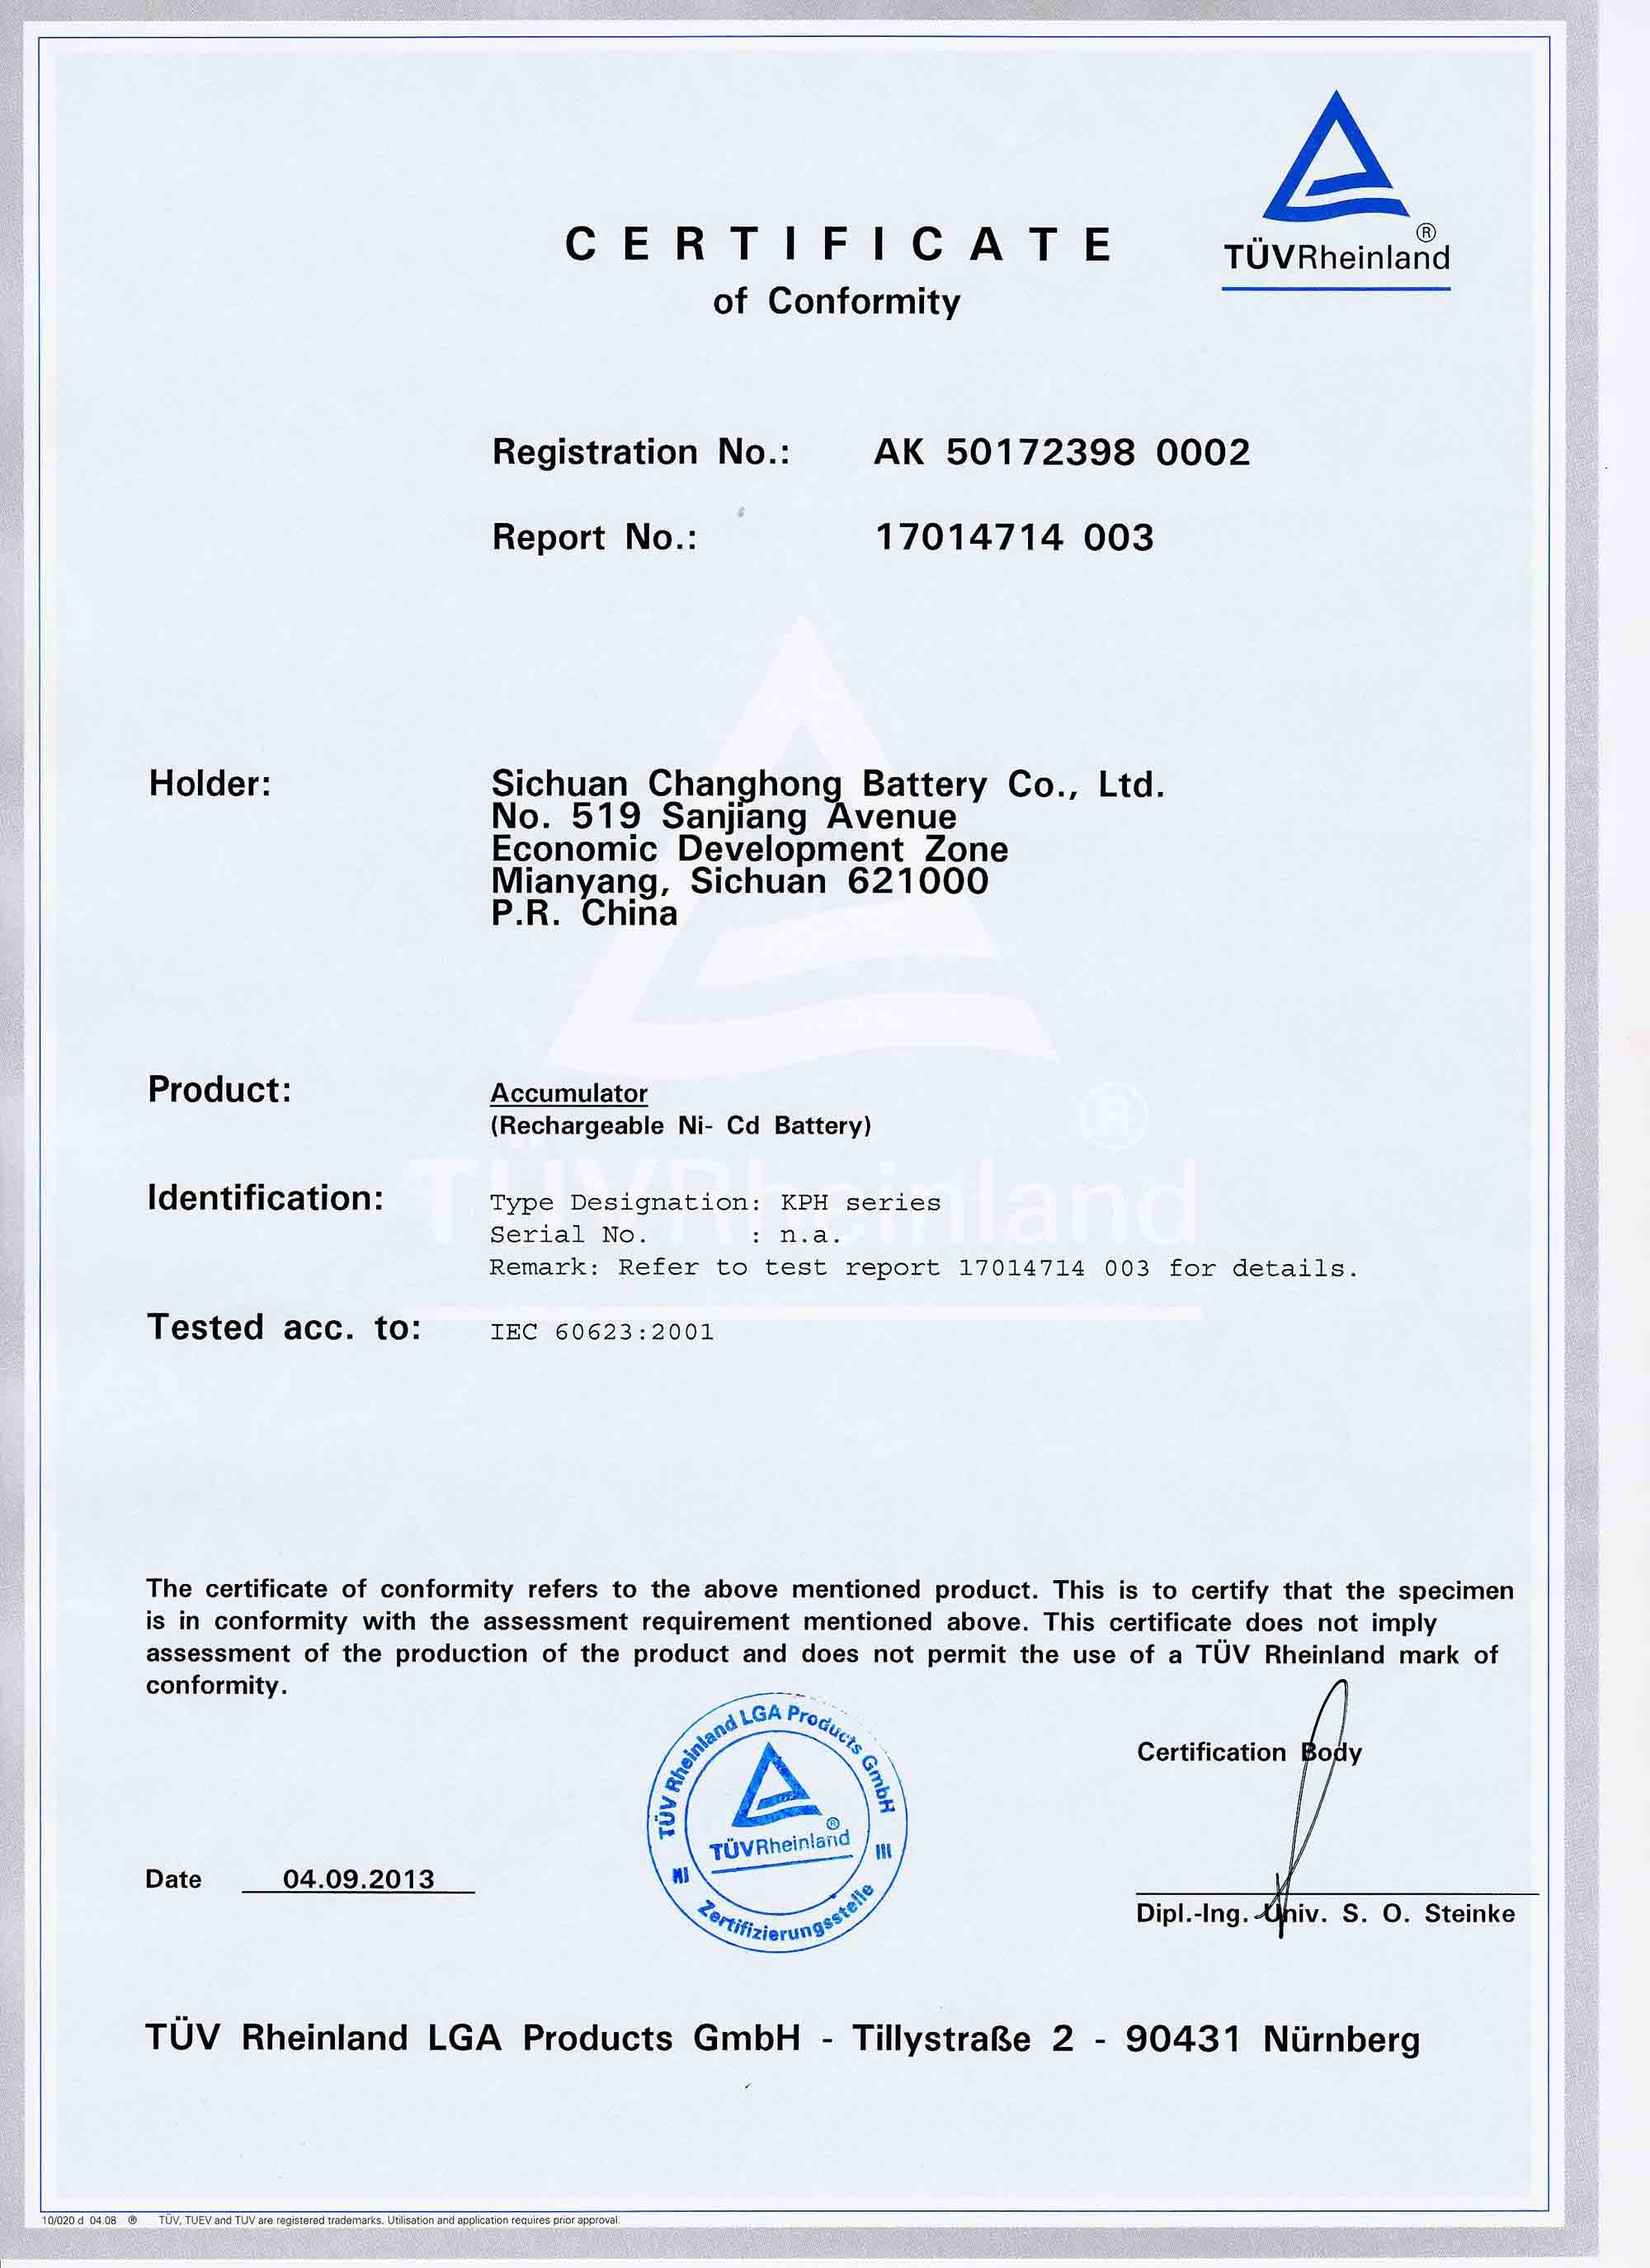 IEC 60623 for KPH series